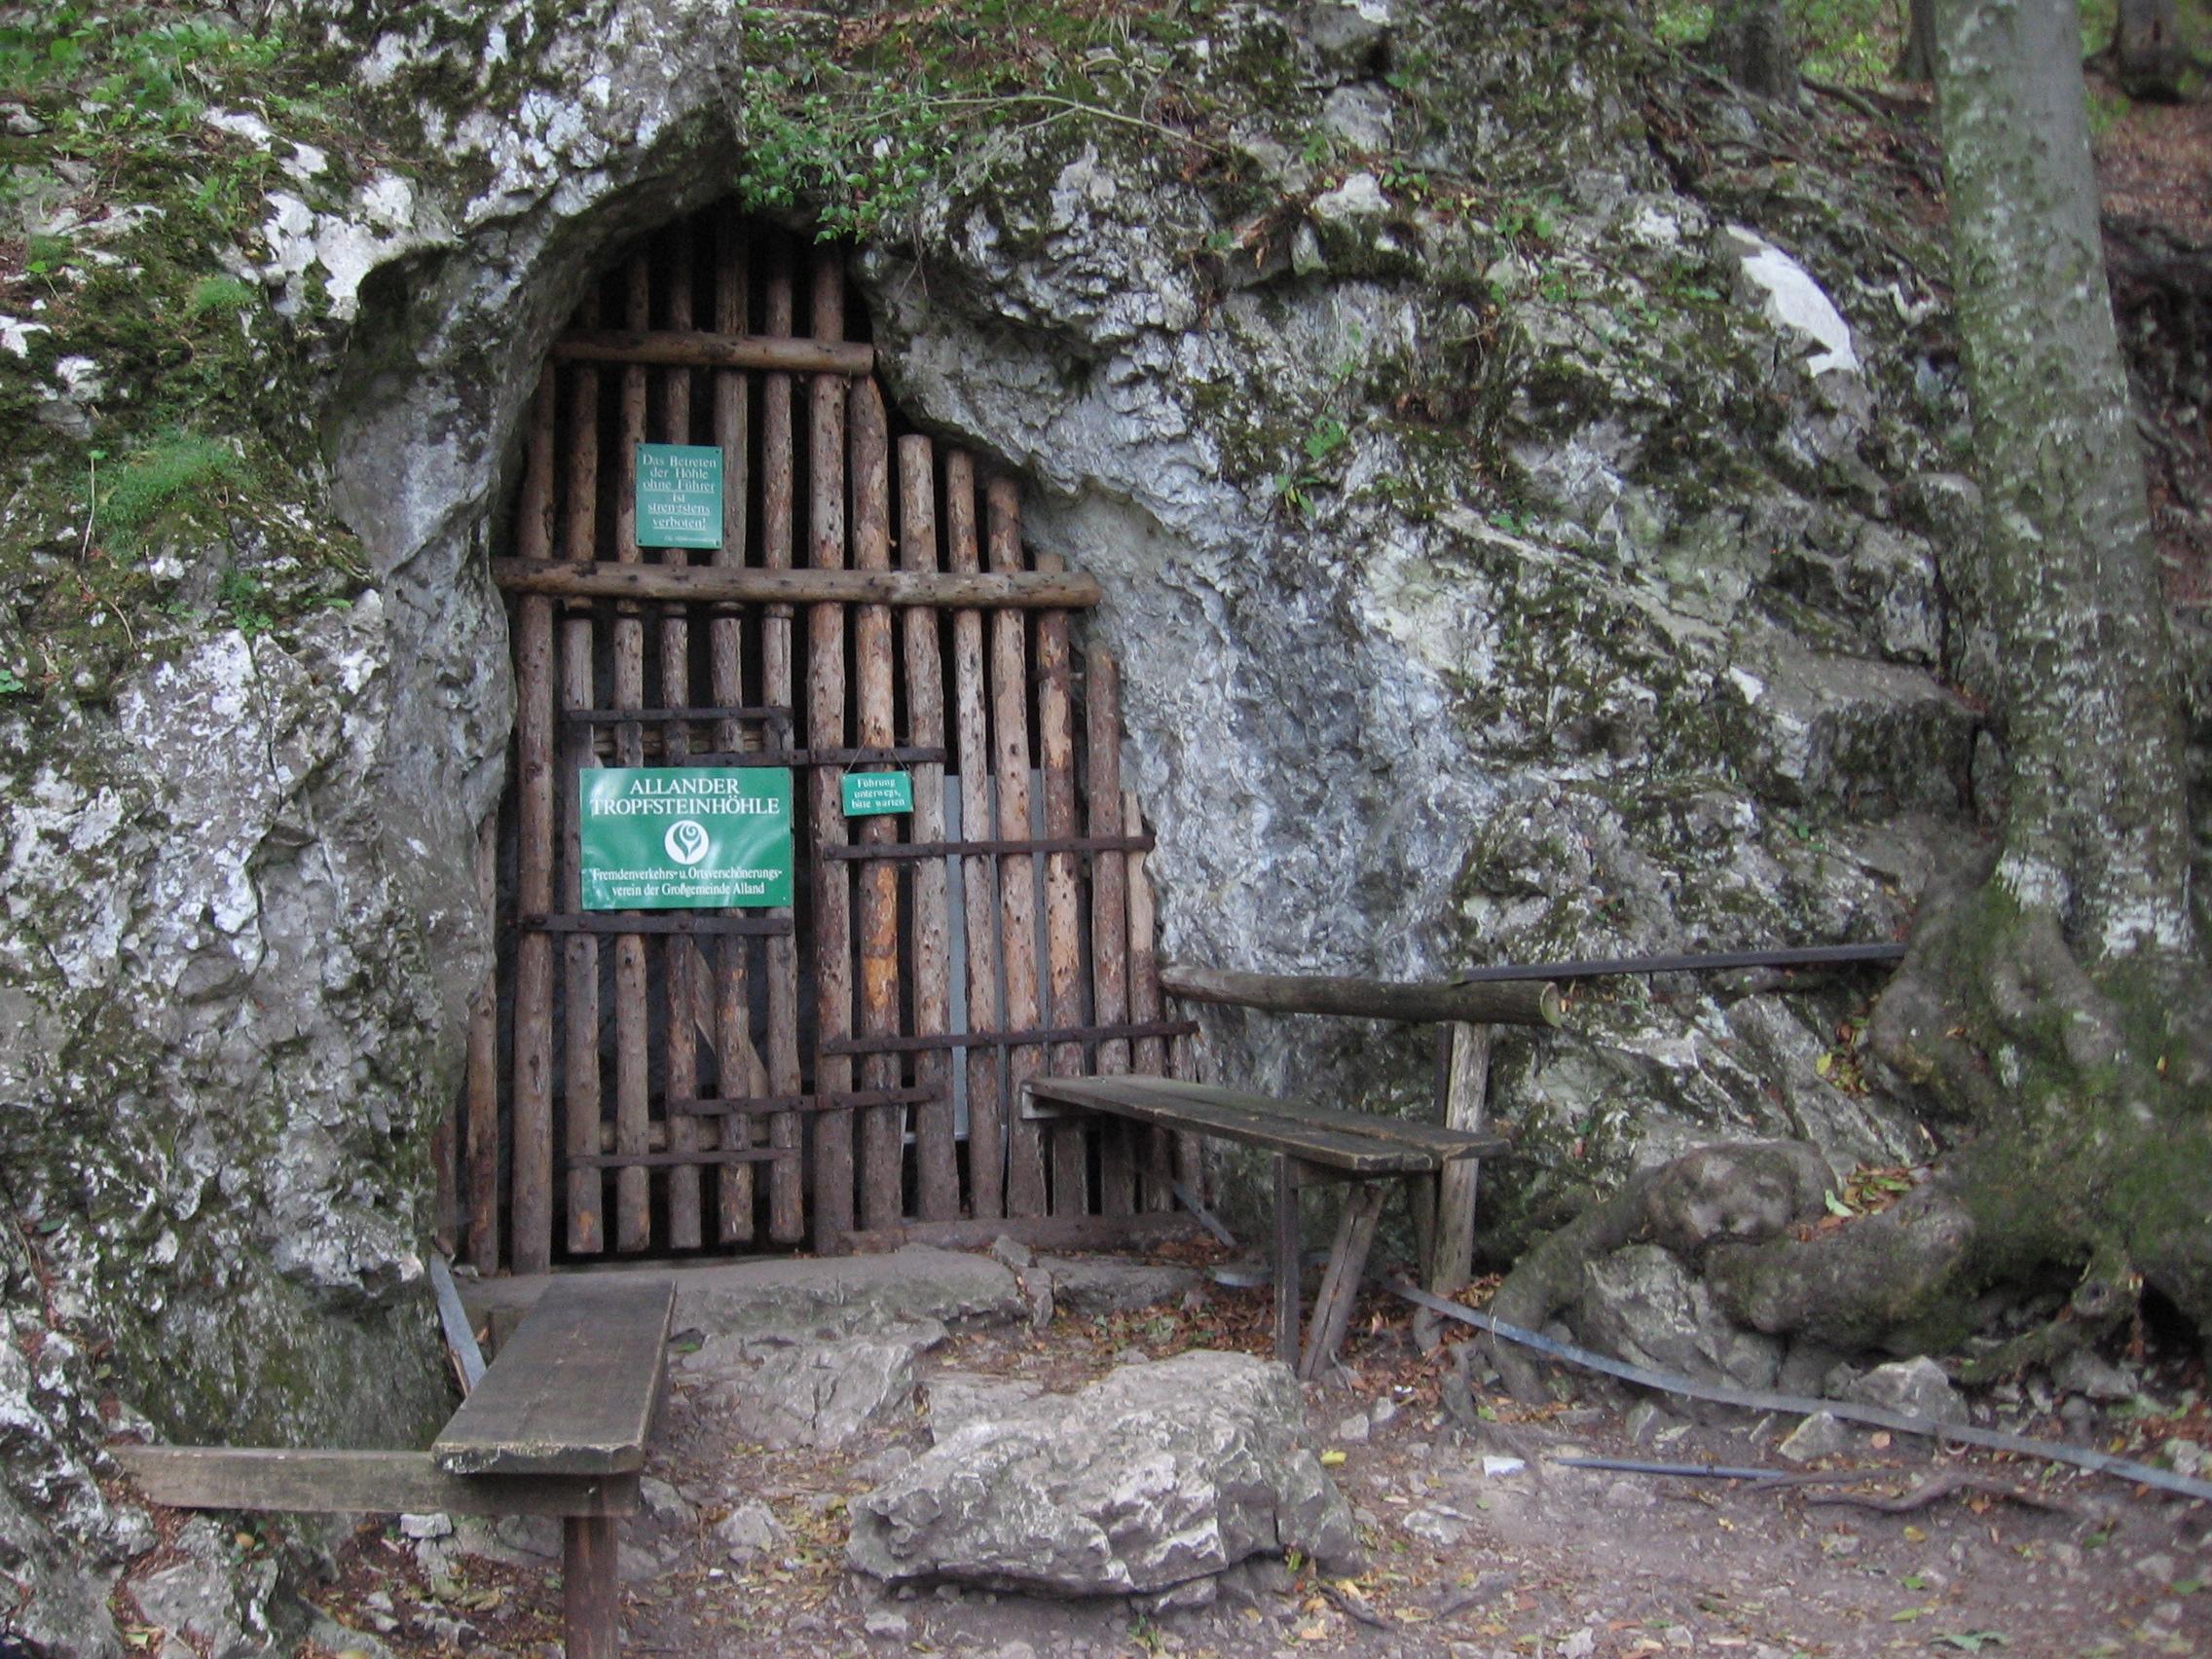 Stalactite cave of Alland - Wienerwald